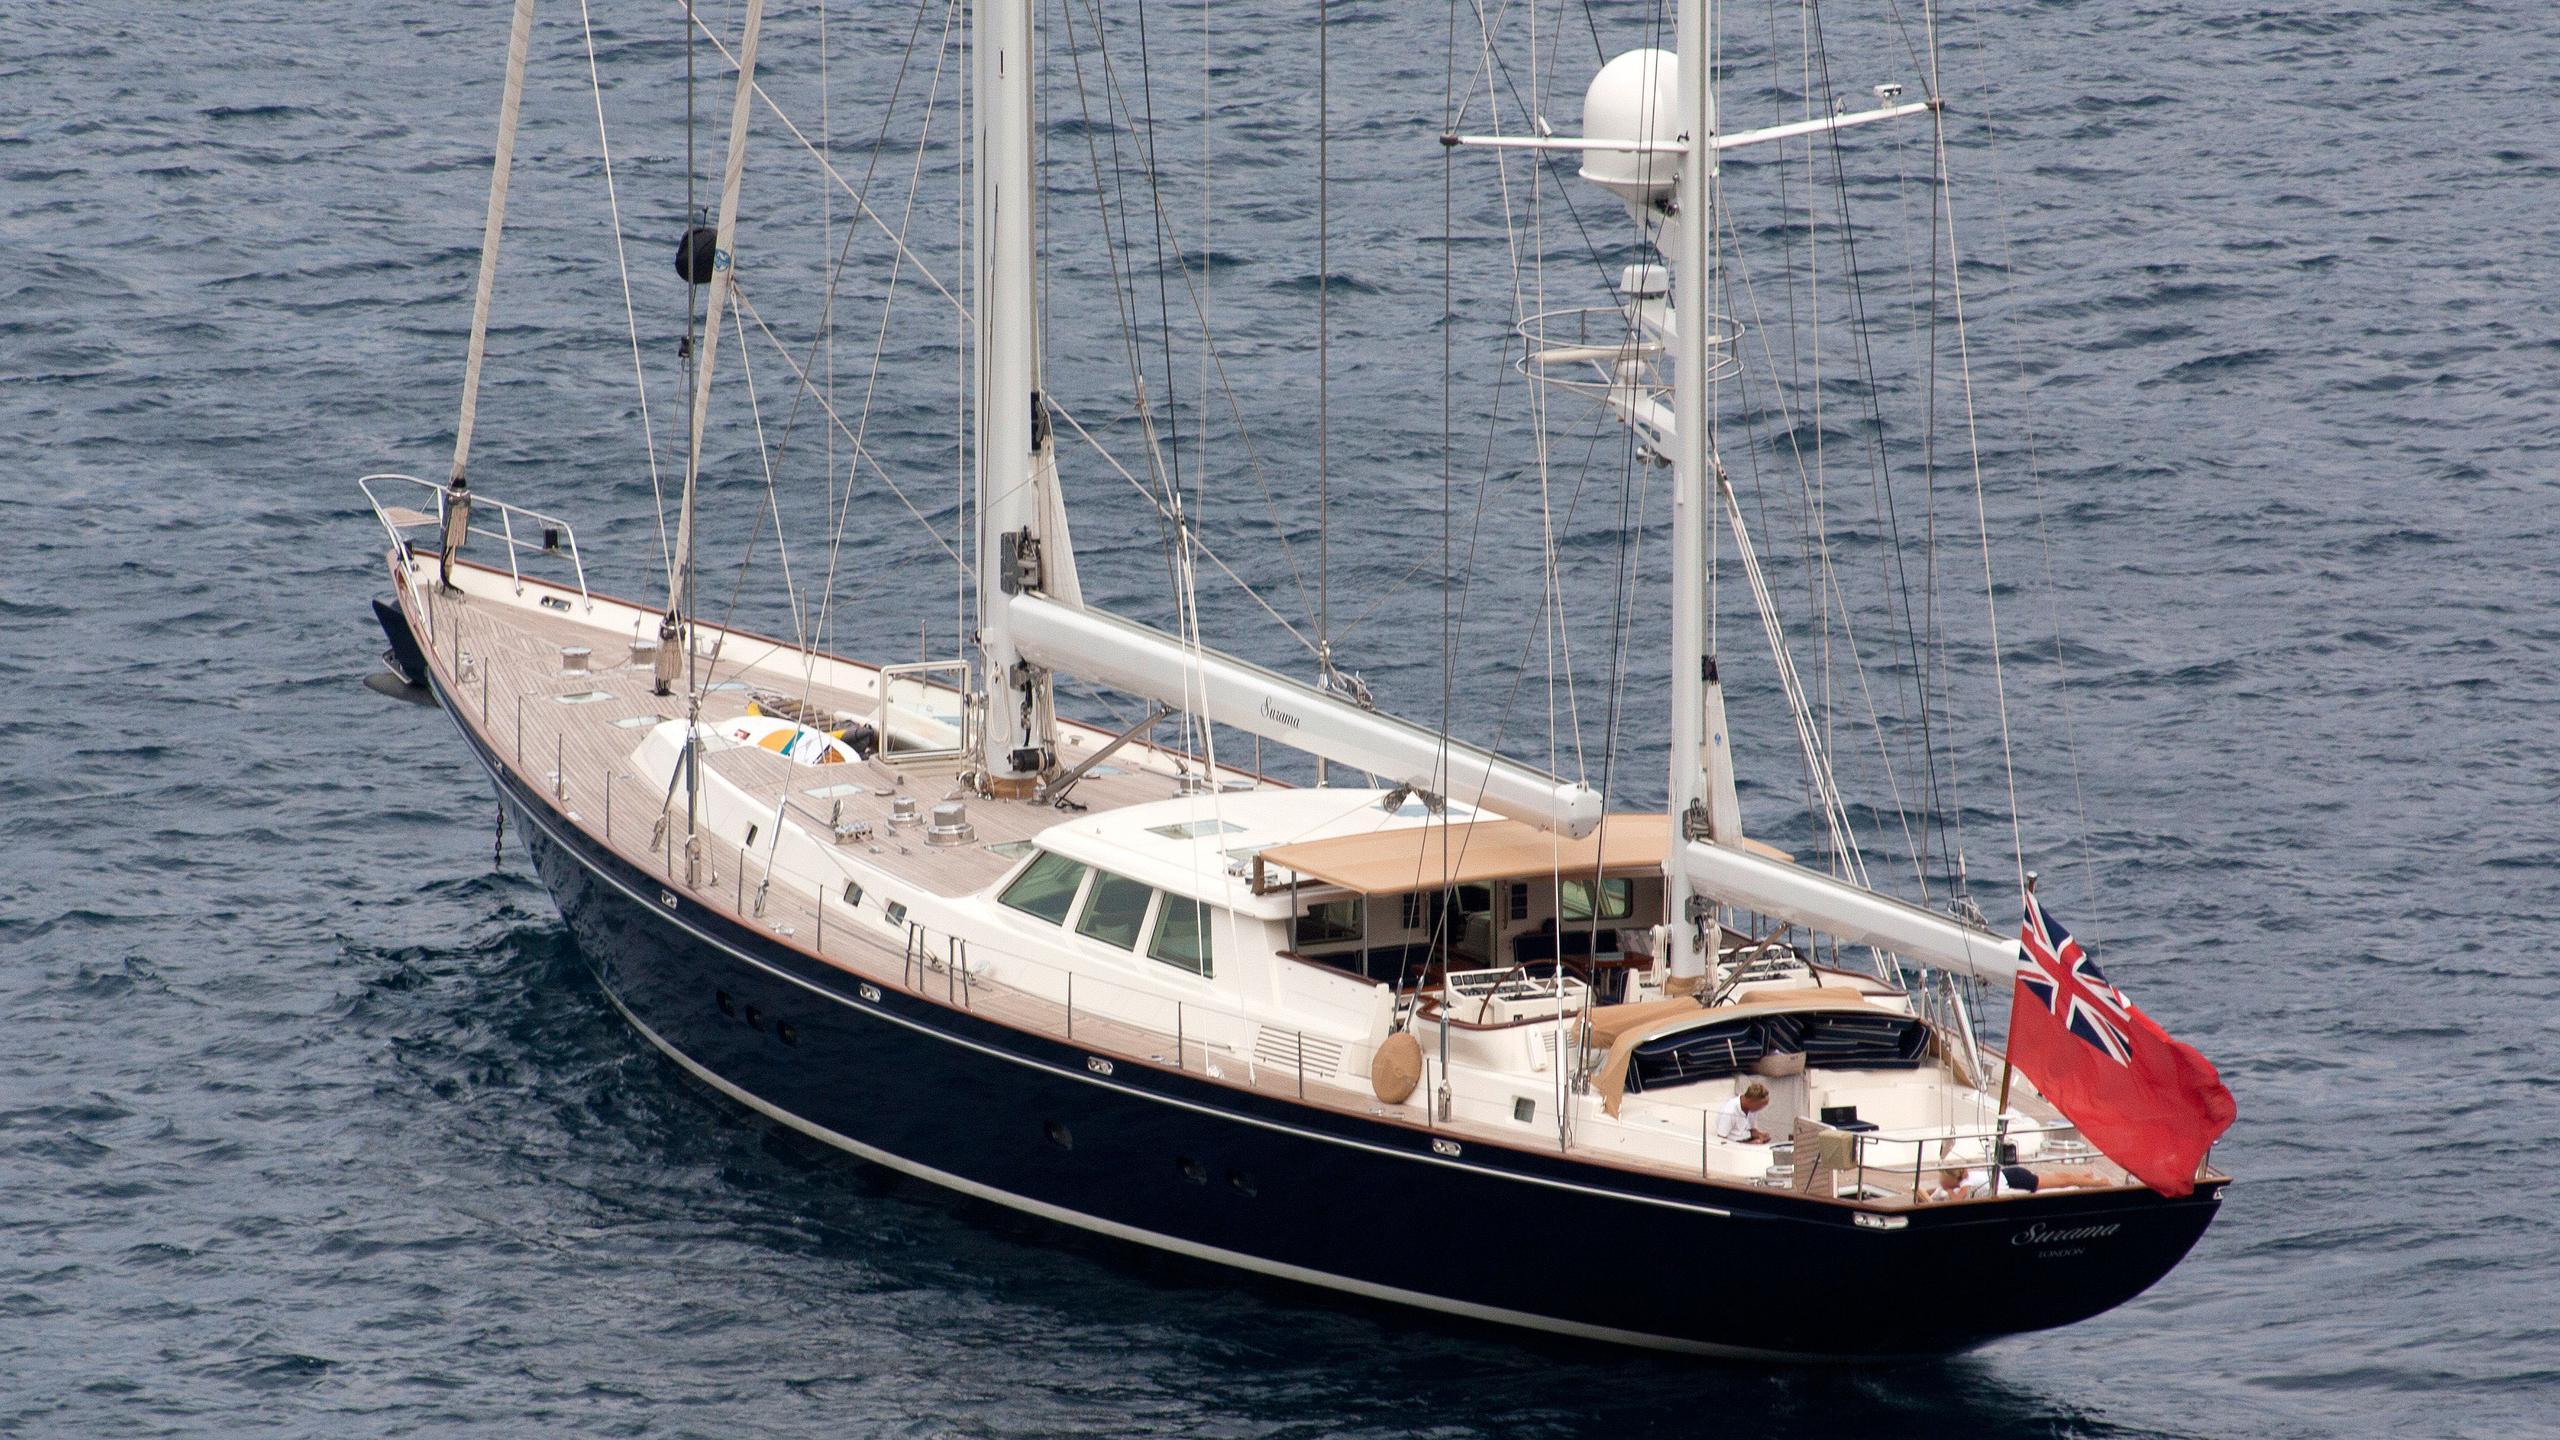 surama-sailing-yacht-royal-huisman-1997-41m-profile